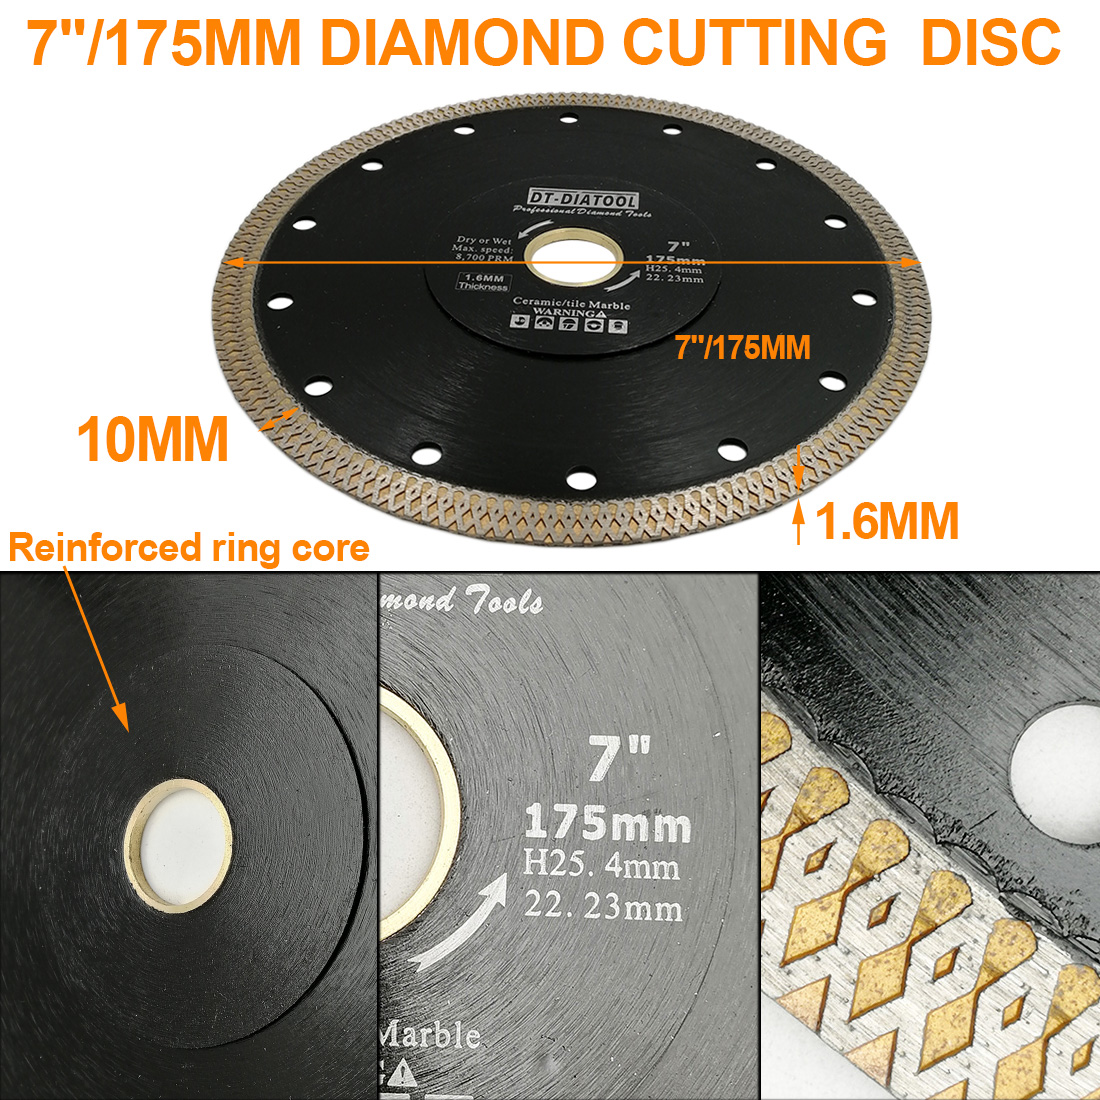 DT-DIATOOL Diamond Cutting Saw-Blades Porcelain Ceramic-Tile Disc-X-Mesh 1pc for Turbo-Rim